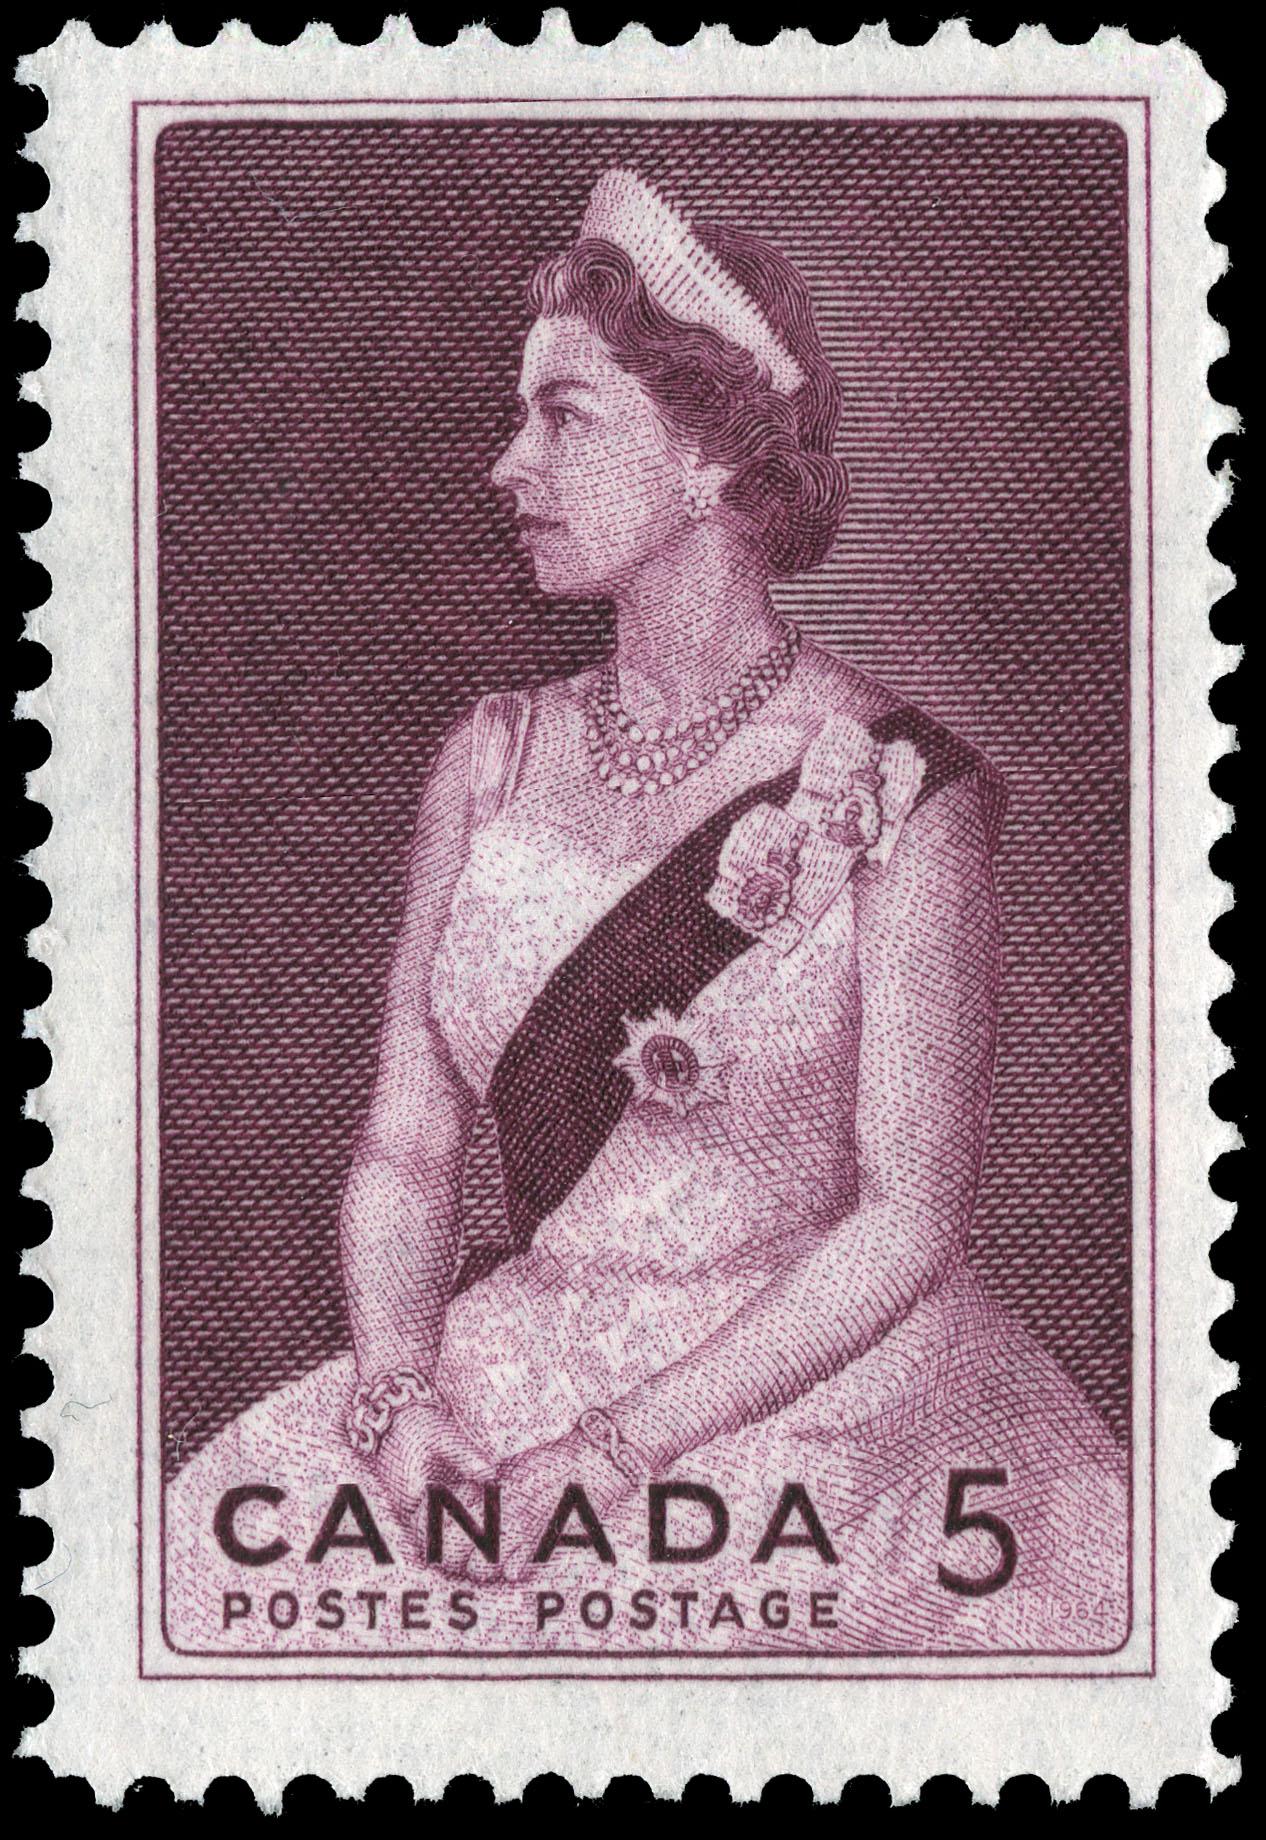 Royal Visit, 1964 Canada Postage Stamp